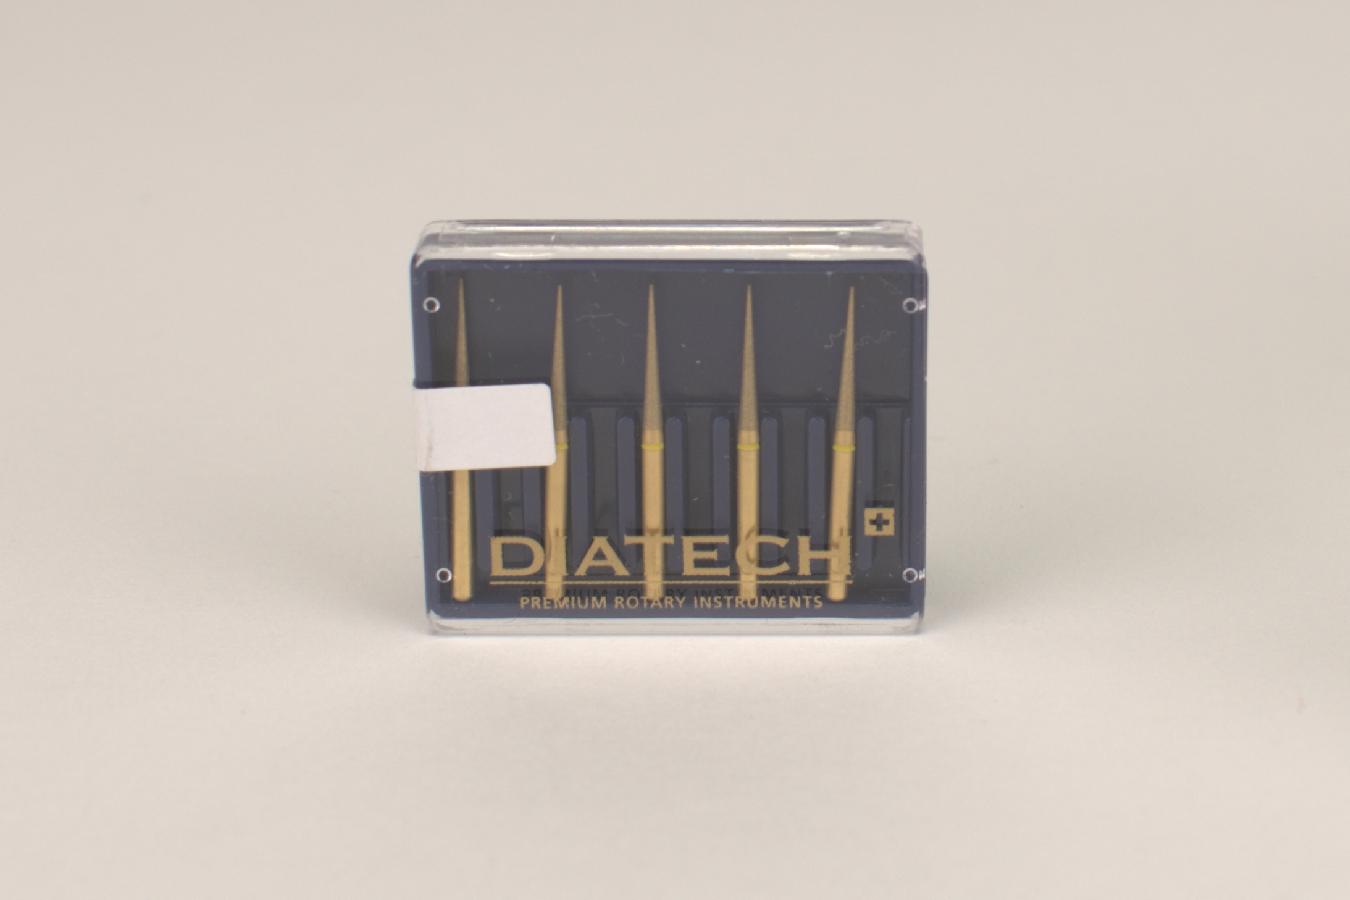 Diatech Diamant FG 859.014 10XF 5St